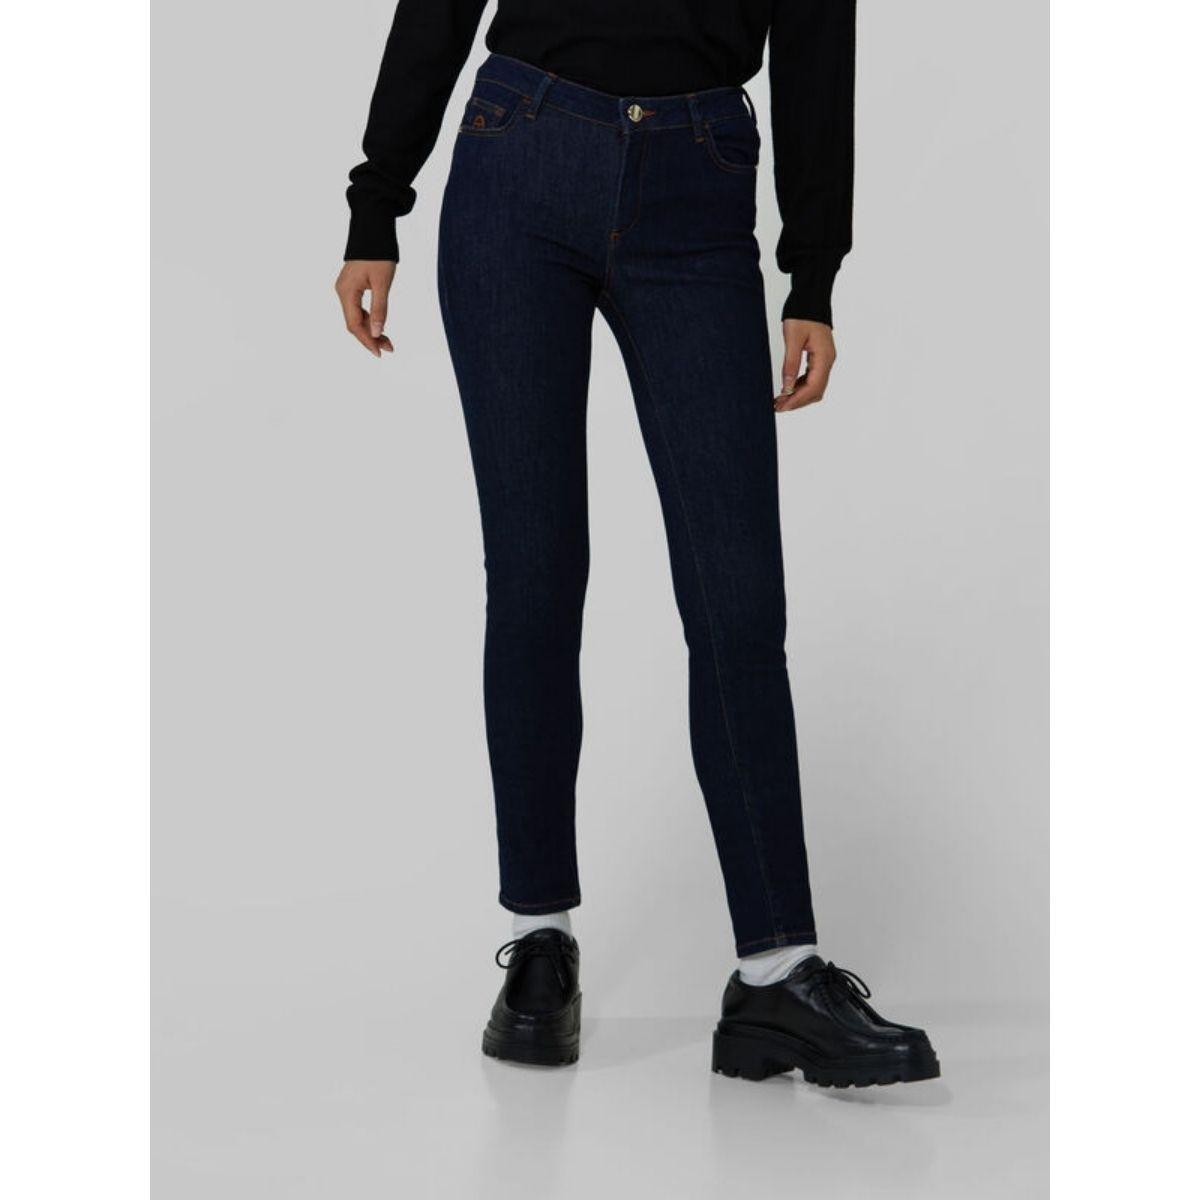 Jeans Trussardi Skinny...